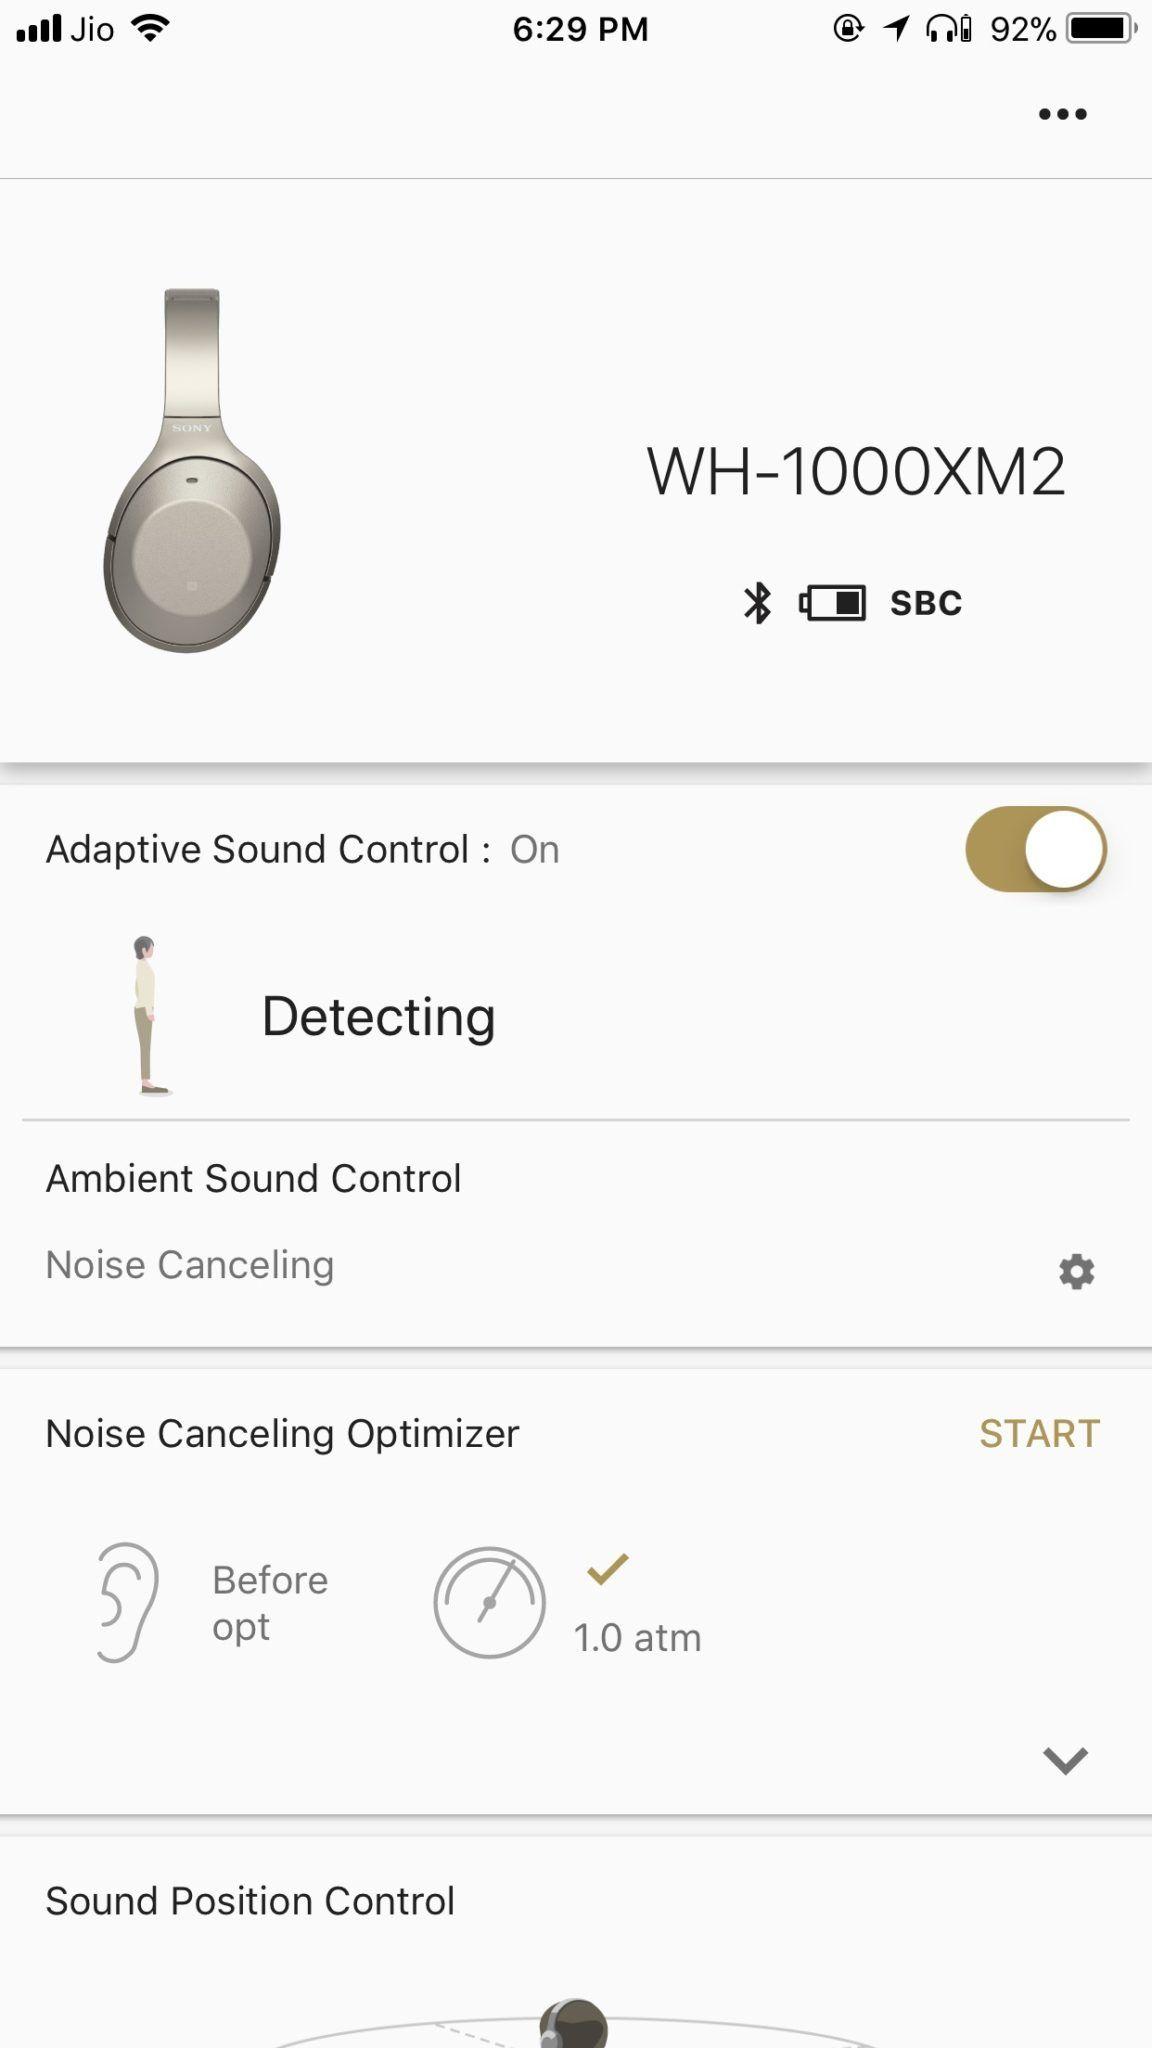 Sony WH-1000xM2 app 1